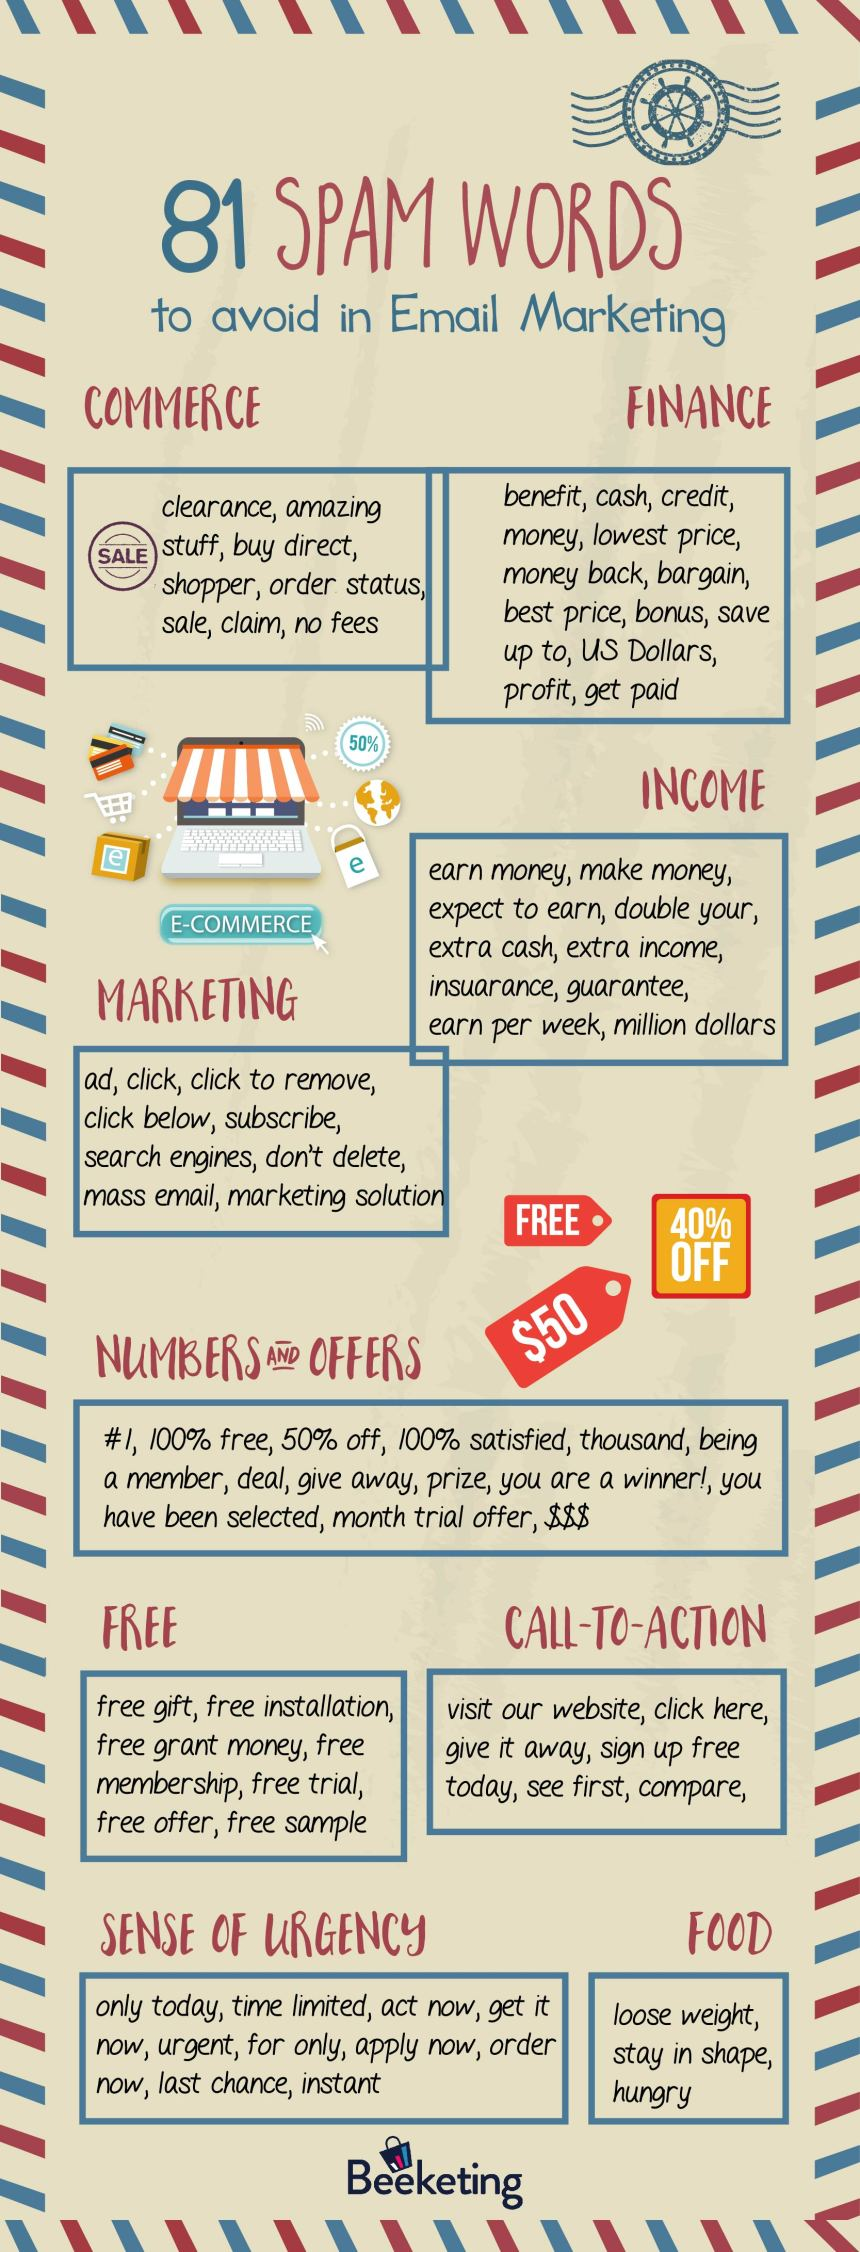 81 palabras spam que se deben evitar en email marketing